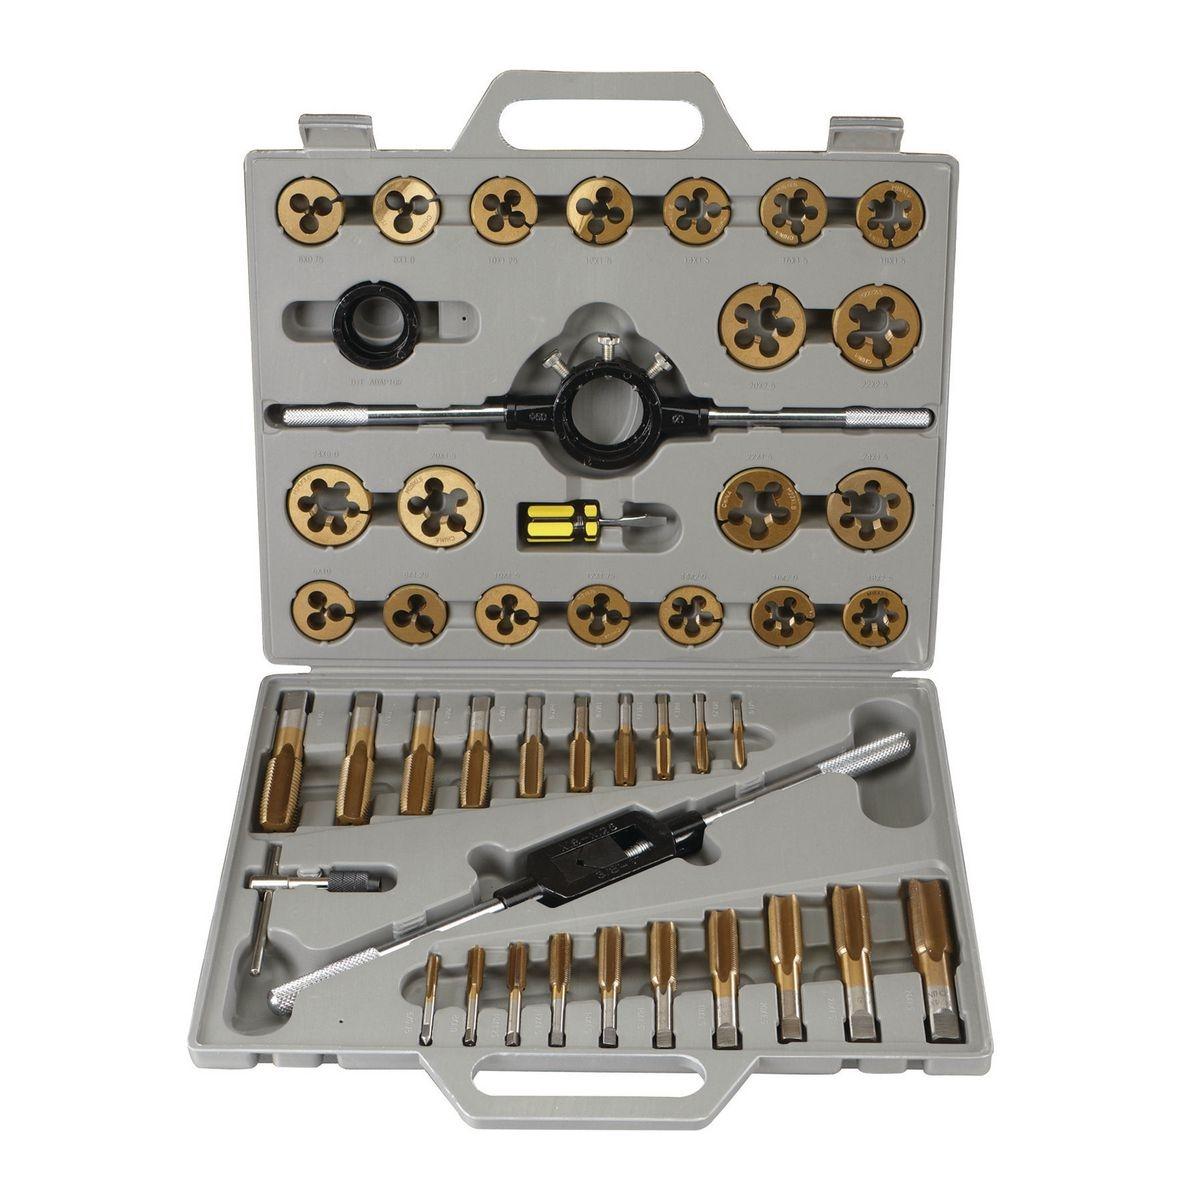 PITTSBURGH Titanium Nitride Coated Alloy Steel Metric Tap & Die Set 45 Pc. - Item 61410 / 41452 / 60676